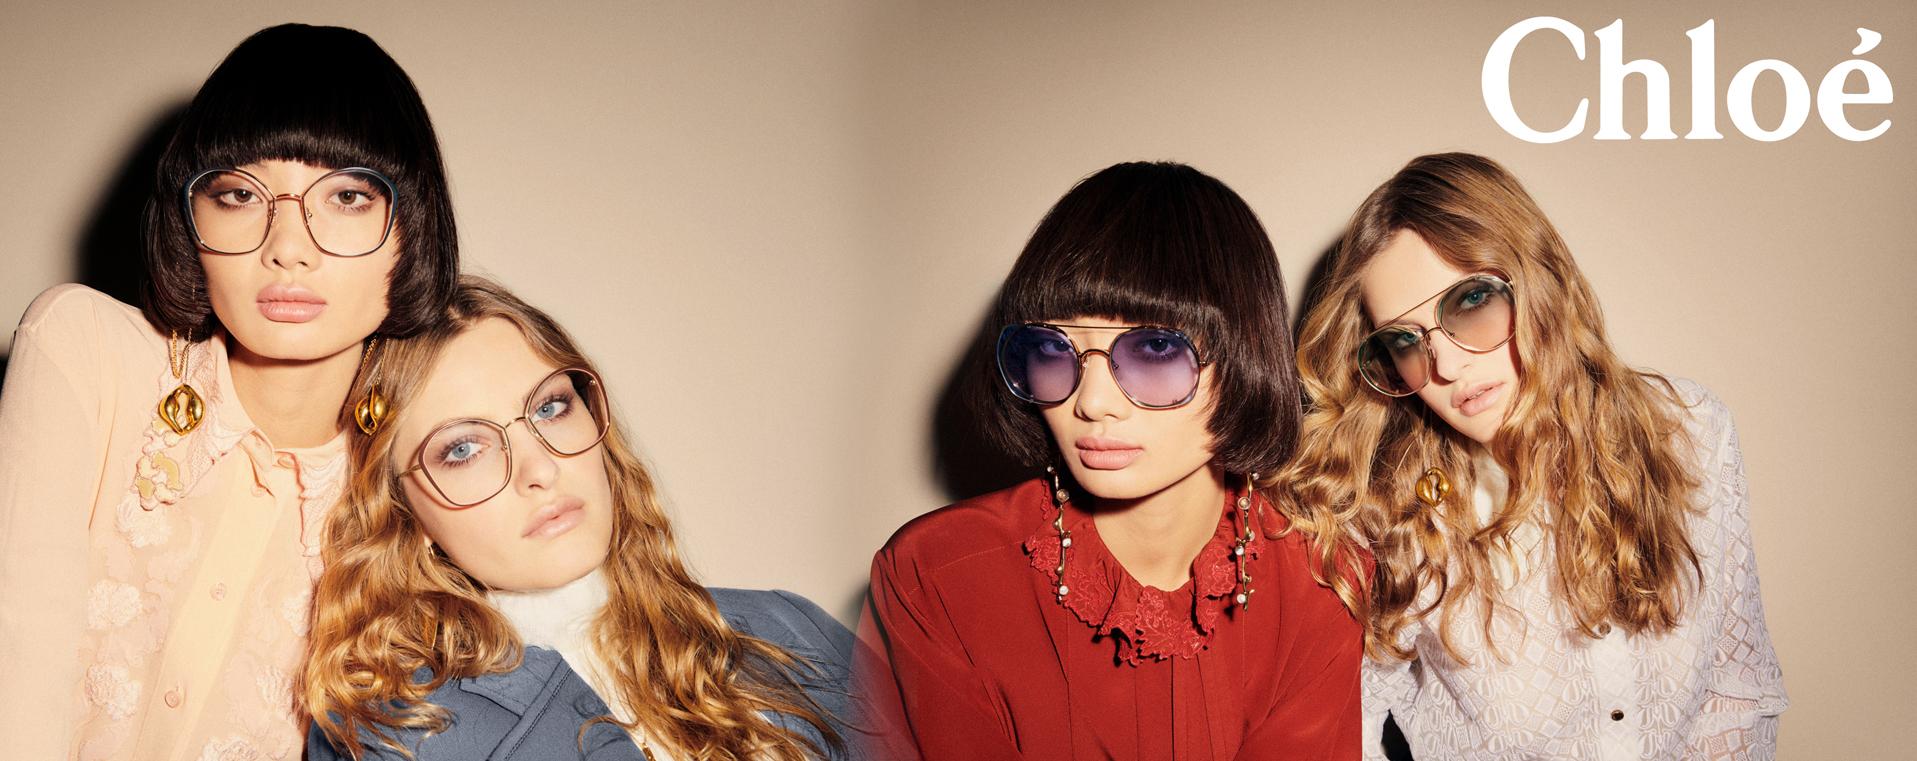 Mao for Chloe Eyewear Campaign